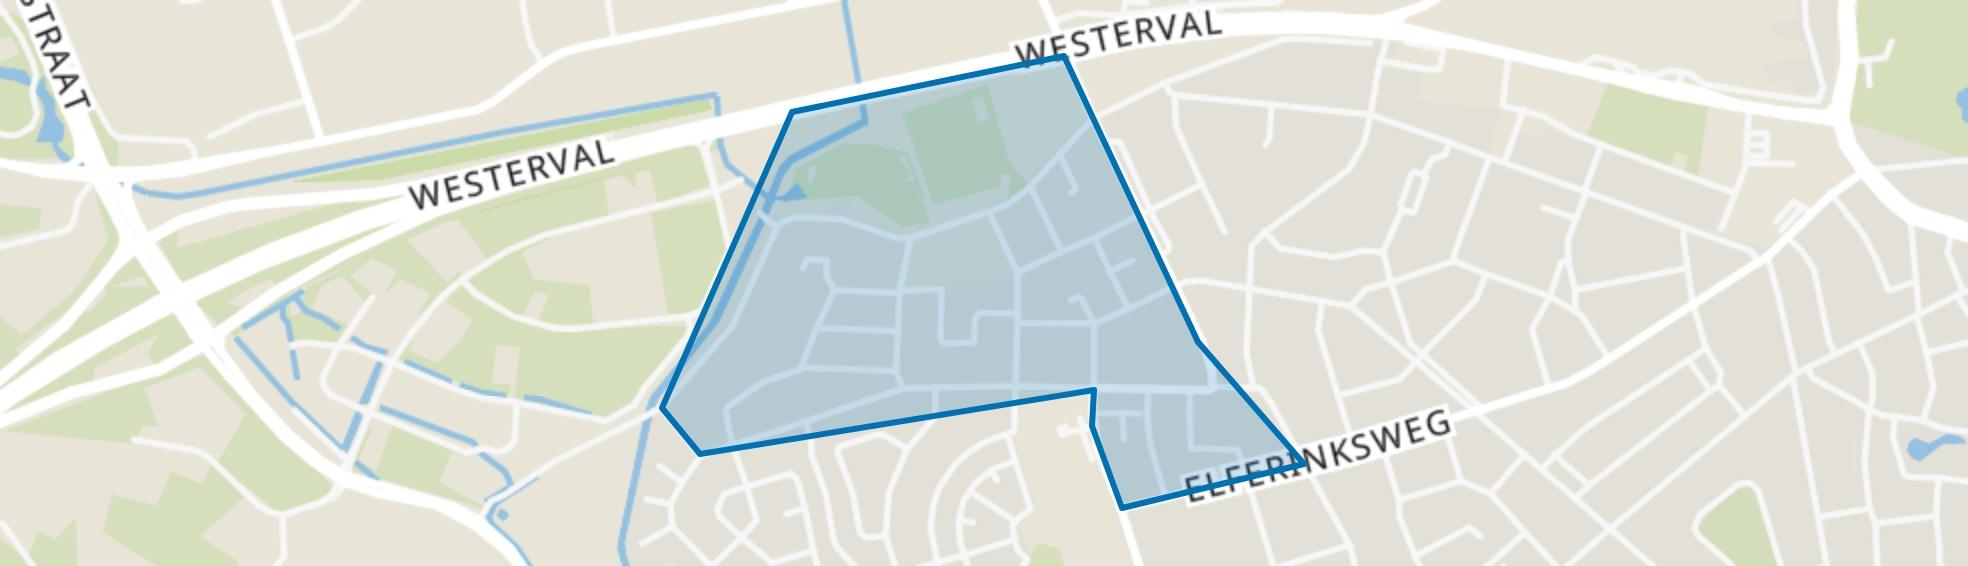 Stadsveld-Noord-Bruggert, Enschede map